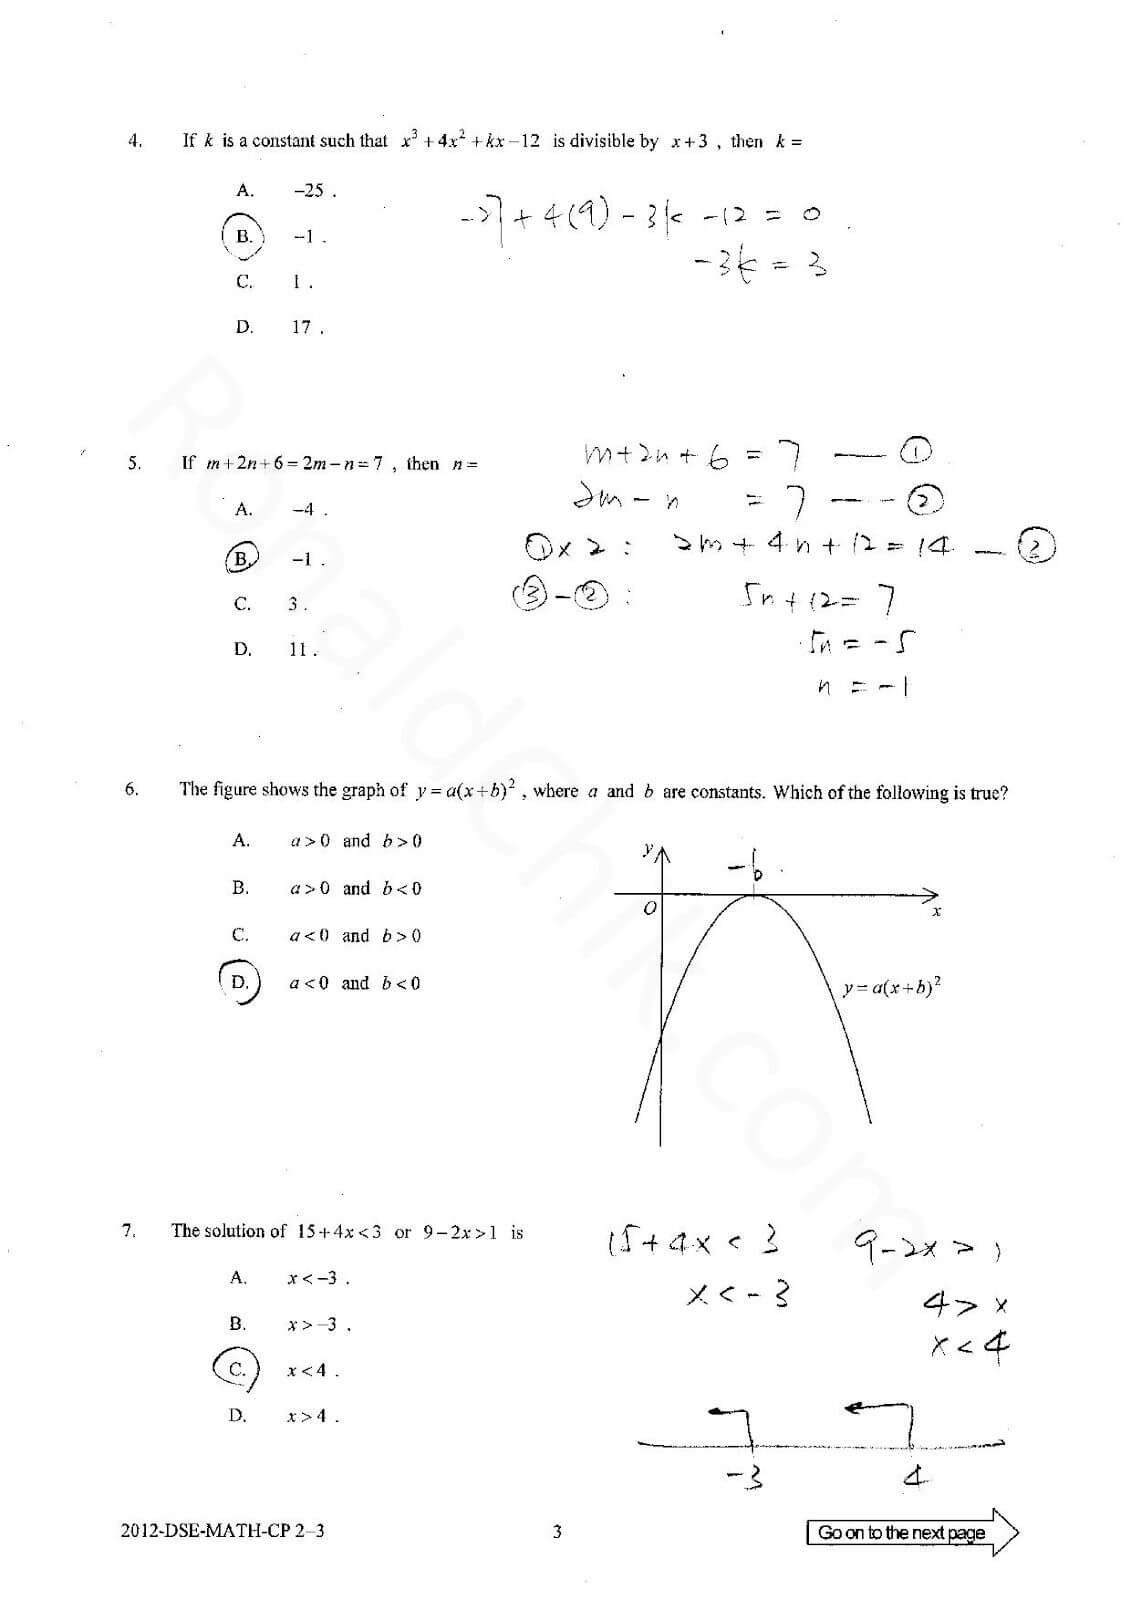 2012 DSE Math P2 卷二 Q4,5,6,7